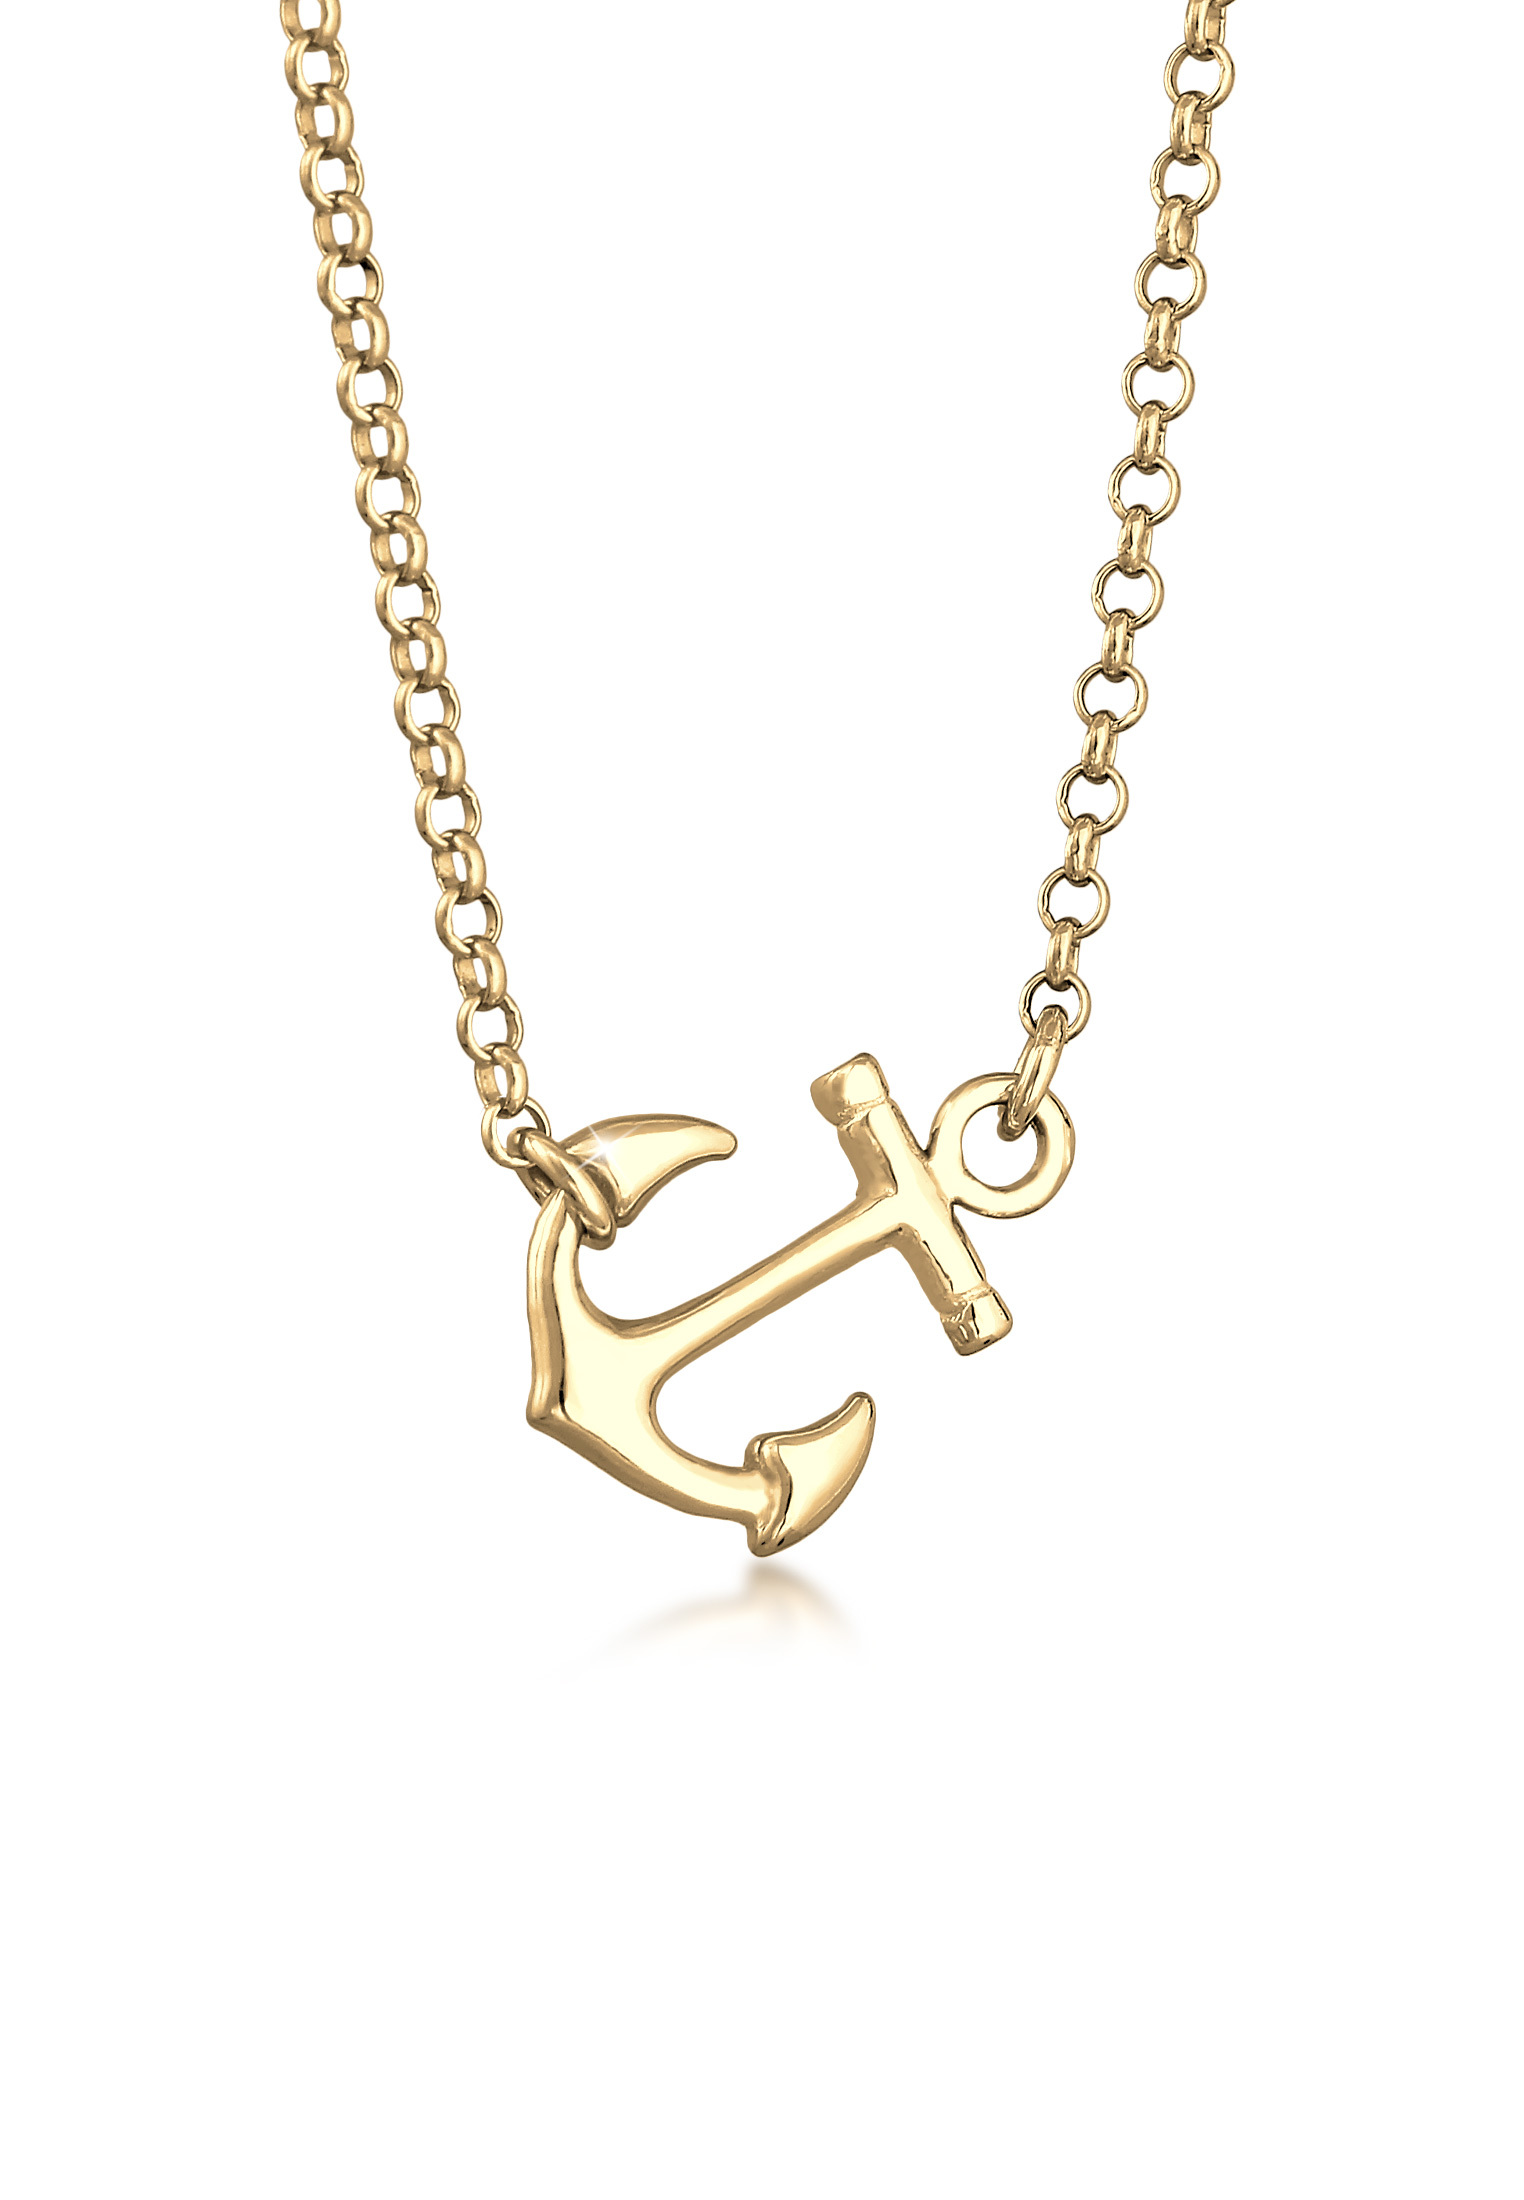 Halskette Anker   925 Sterling Silber vergoldet